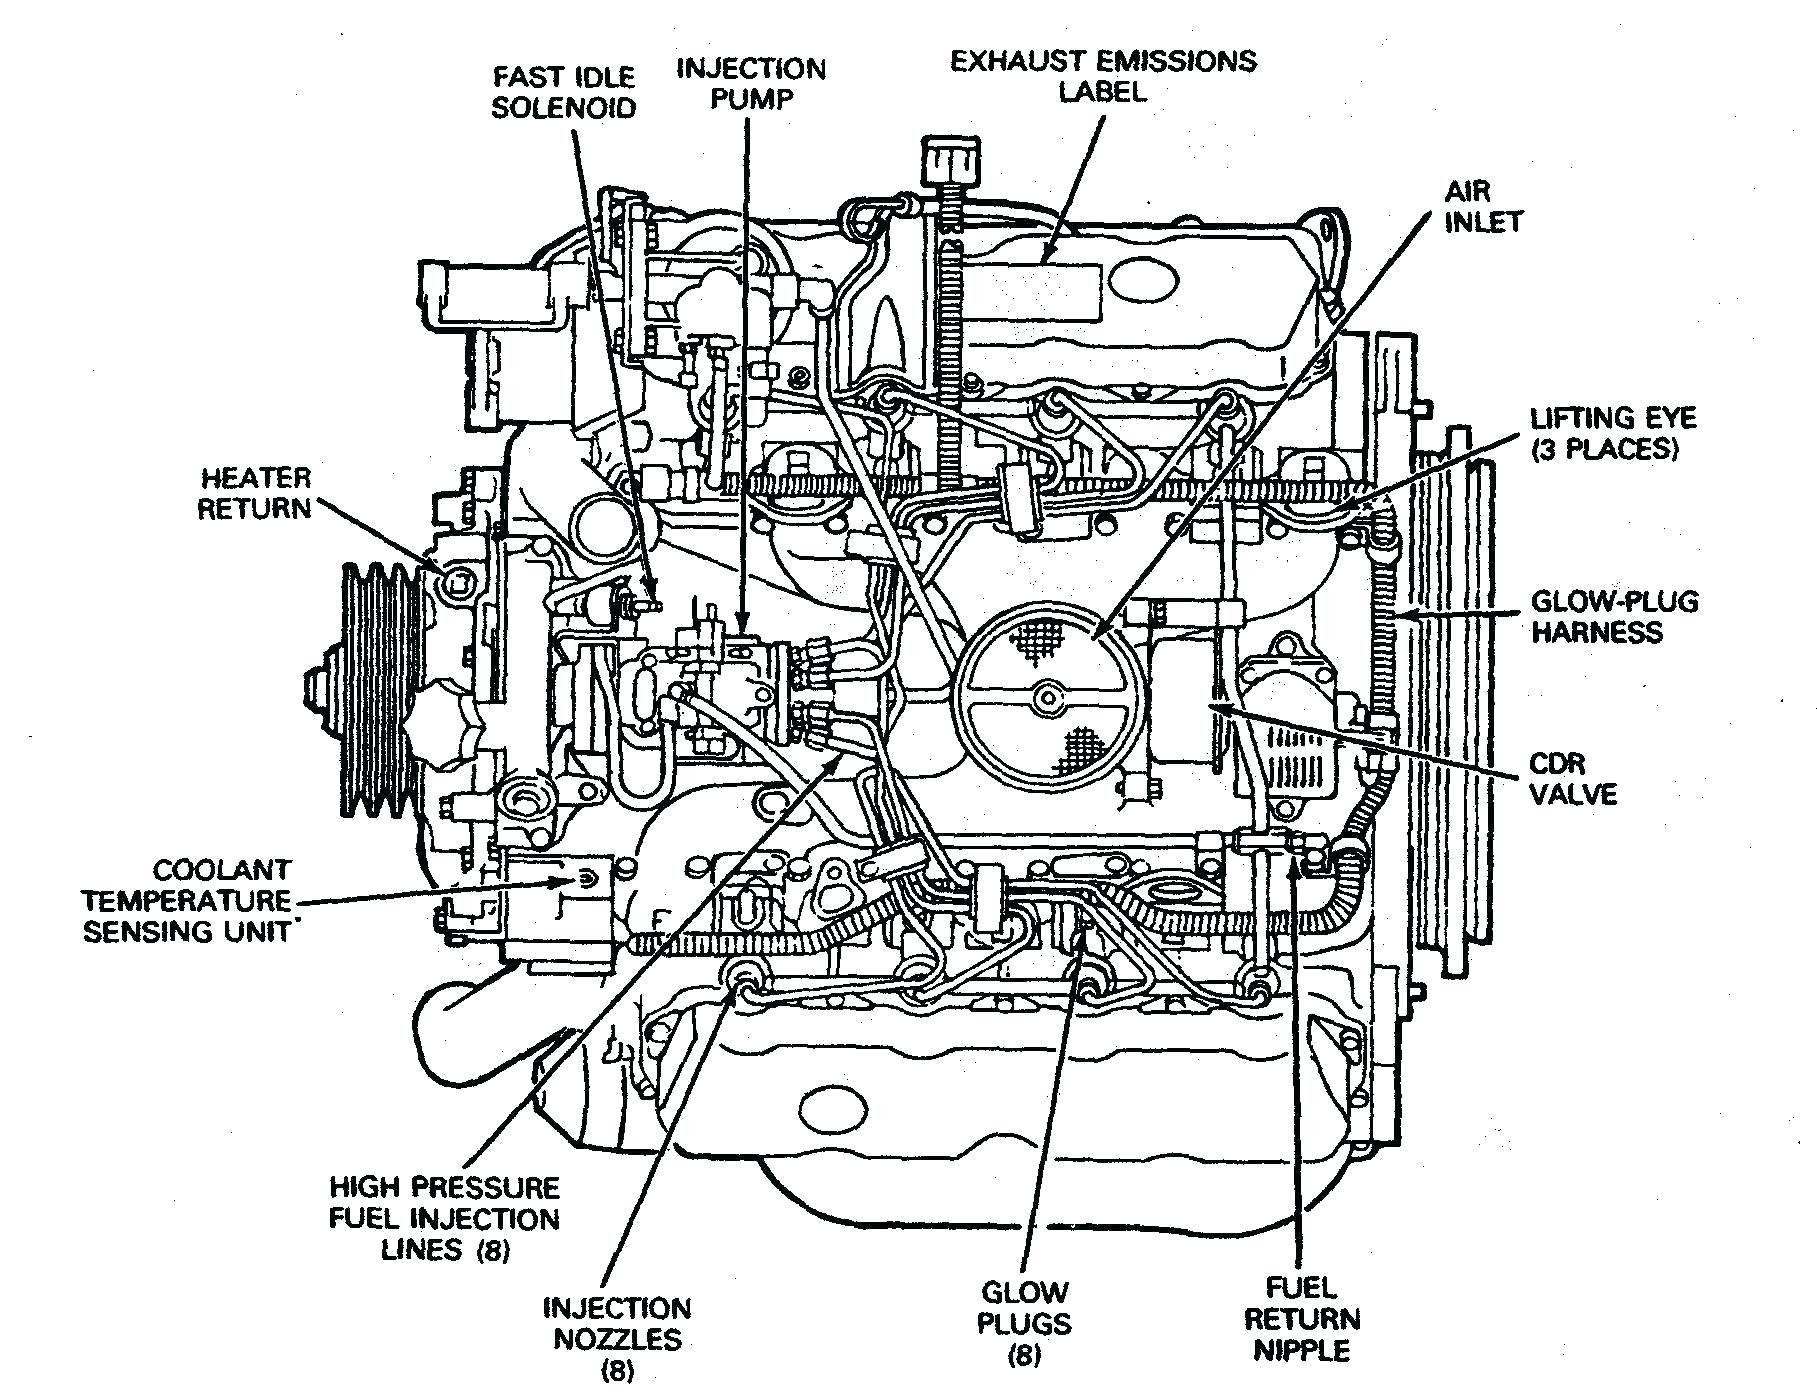 Swell Ej25 Engine Diagram Basic Electronics Wiring Diagram Wiring Database Liteviha4X4Andersnl